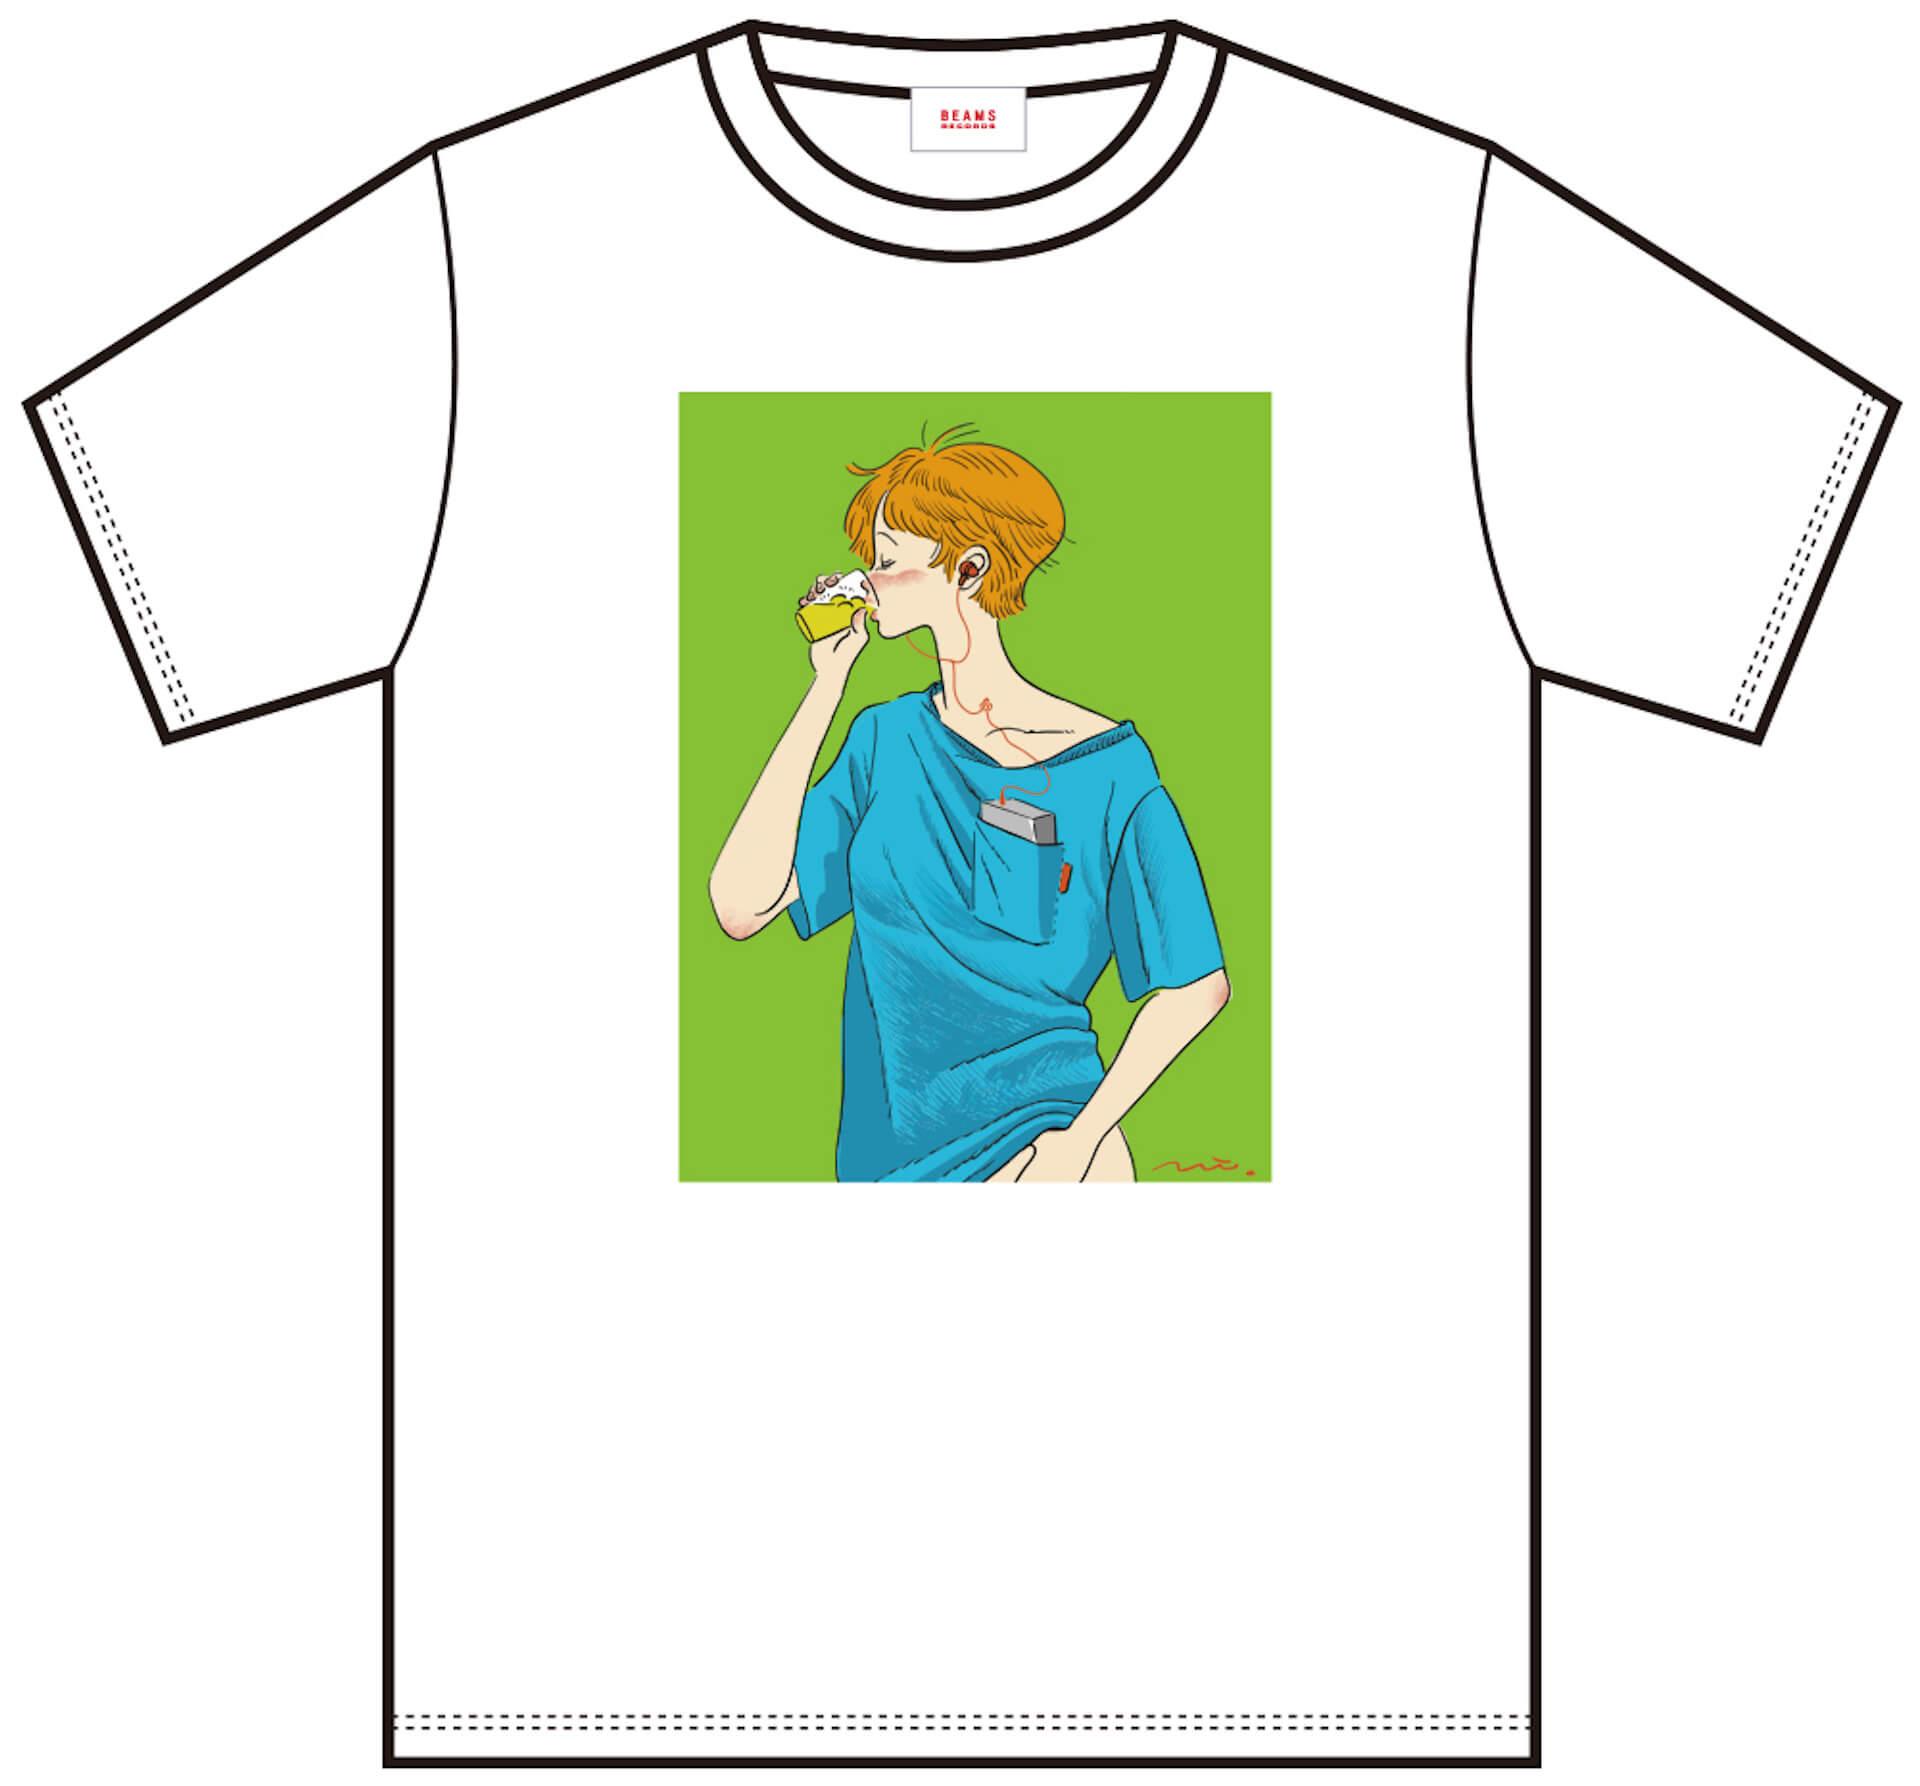 J-WAVE「#音楽を止めるな」BEAMS RECORDS協力のもと、ライブハウスを支援するオリジナルTシャツが受注販売開始! lf200515_jwave_beamsrecords_tshirts_08